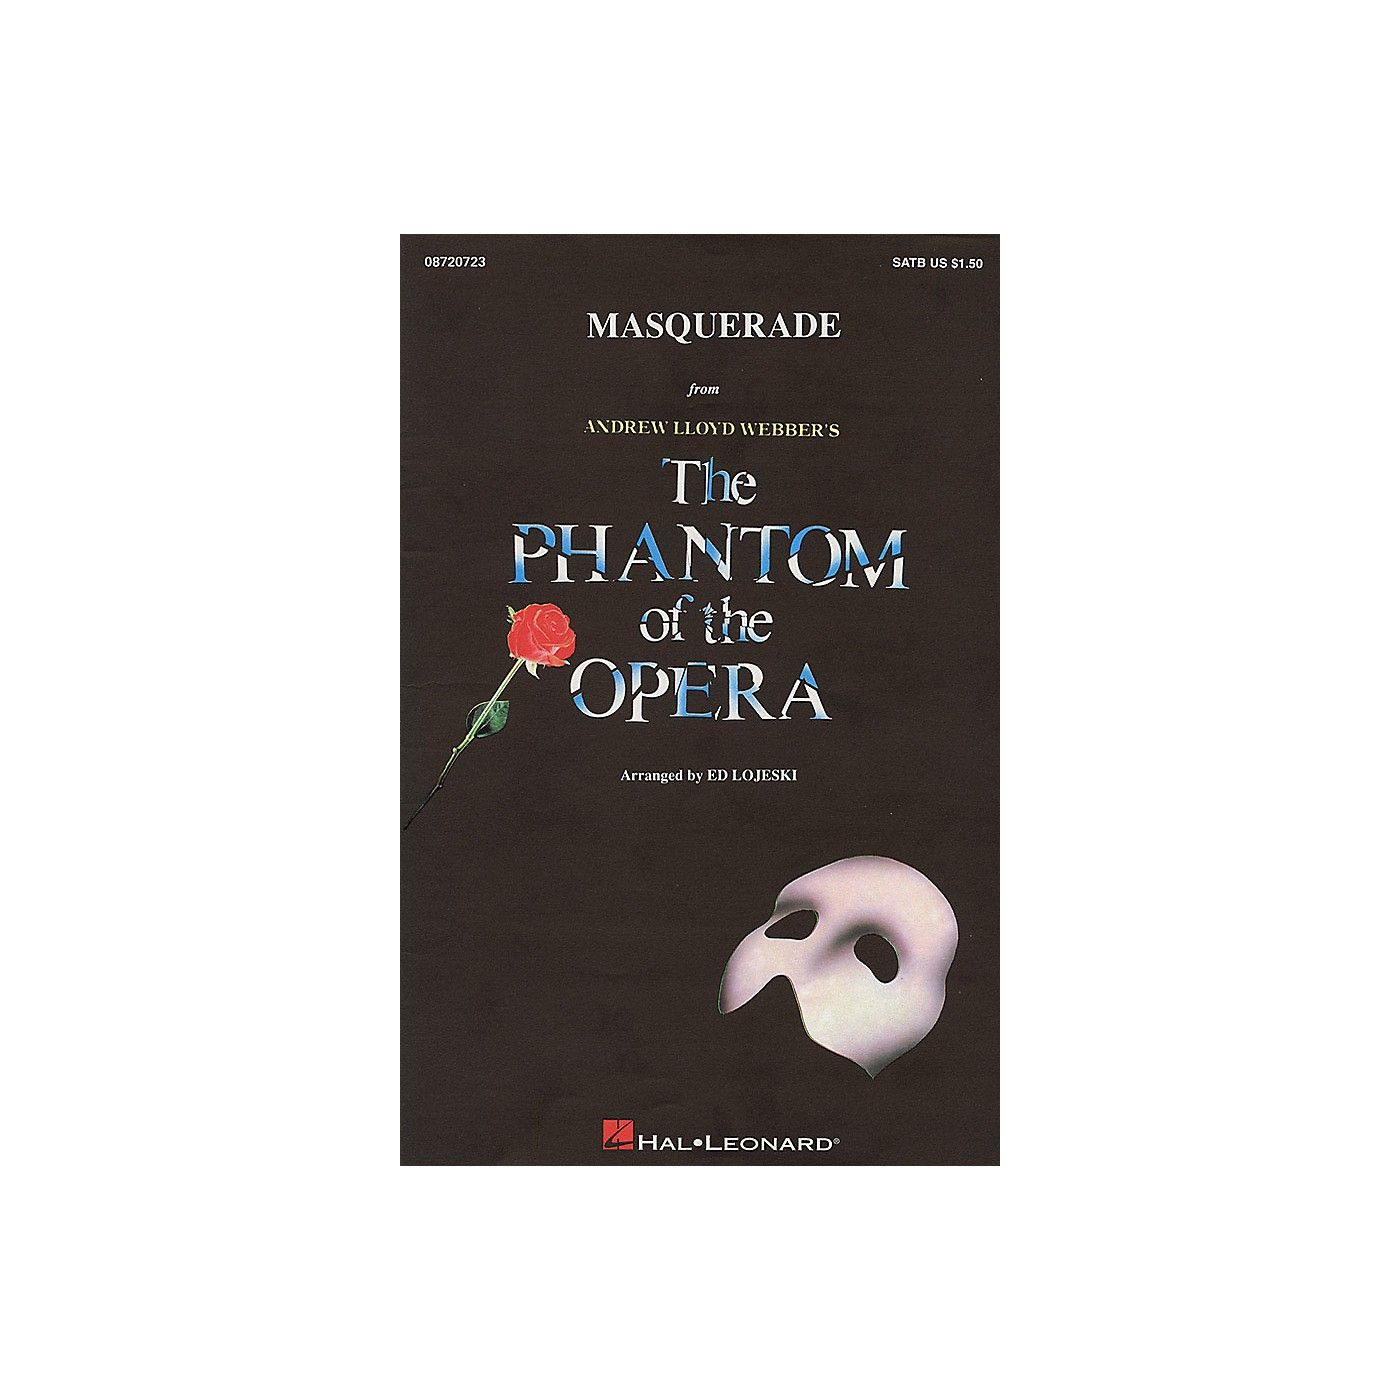 Hal Leonard Masquerade (from The Phantom of the Opera) IPAKR Arranged by Ed Lojeski thumbnail